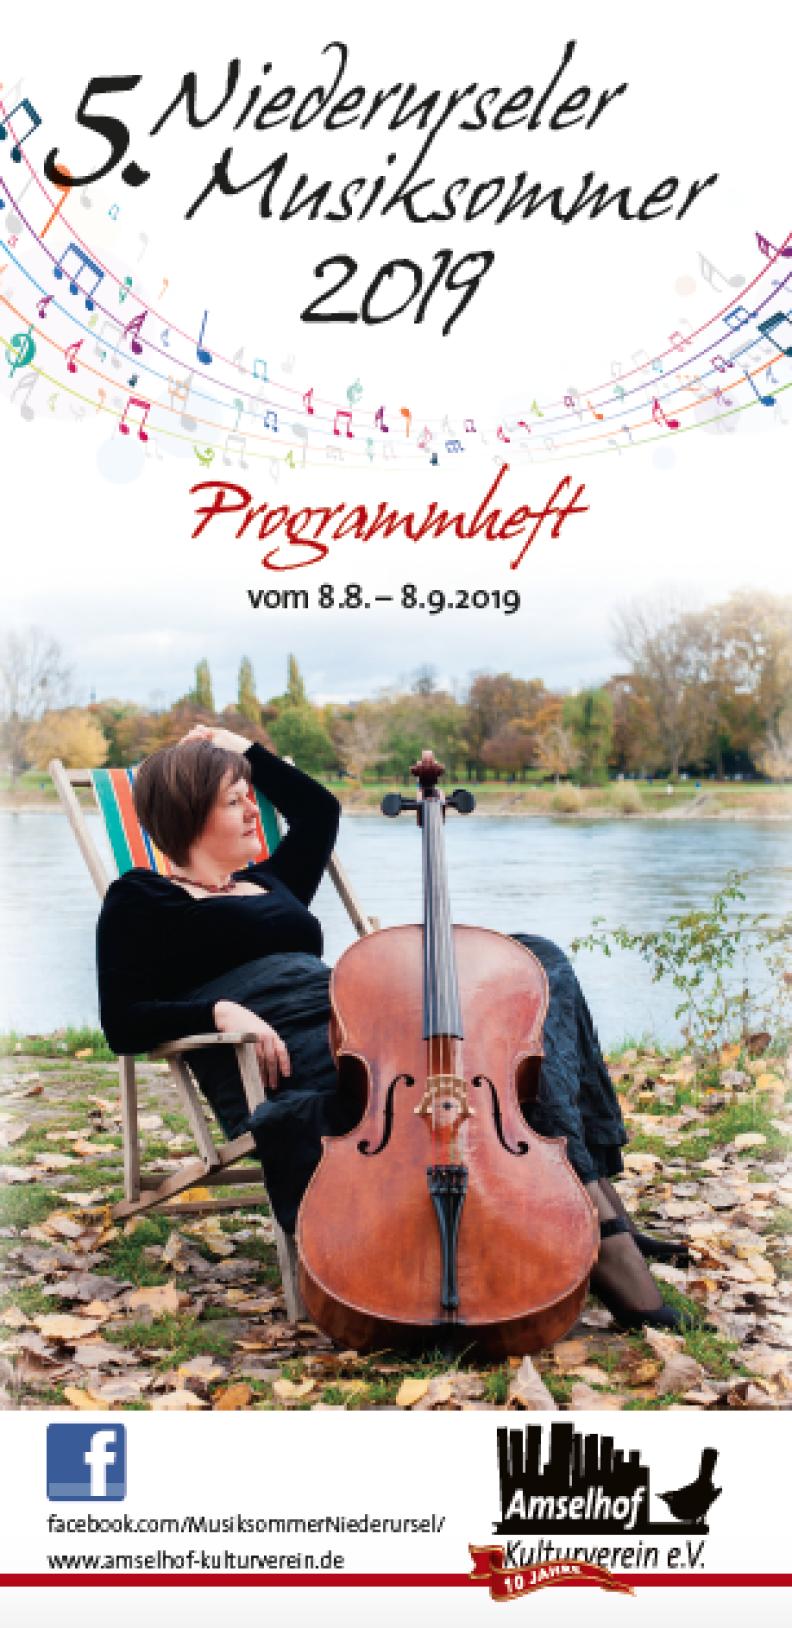 5. Niederurseler Musiksommer 2019